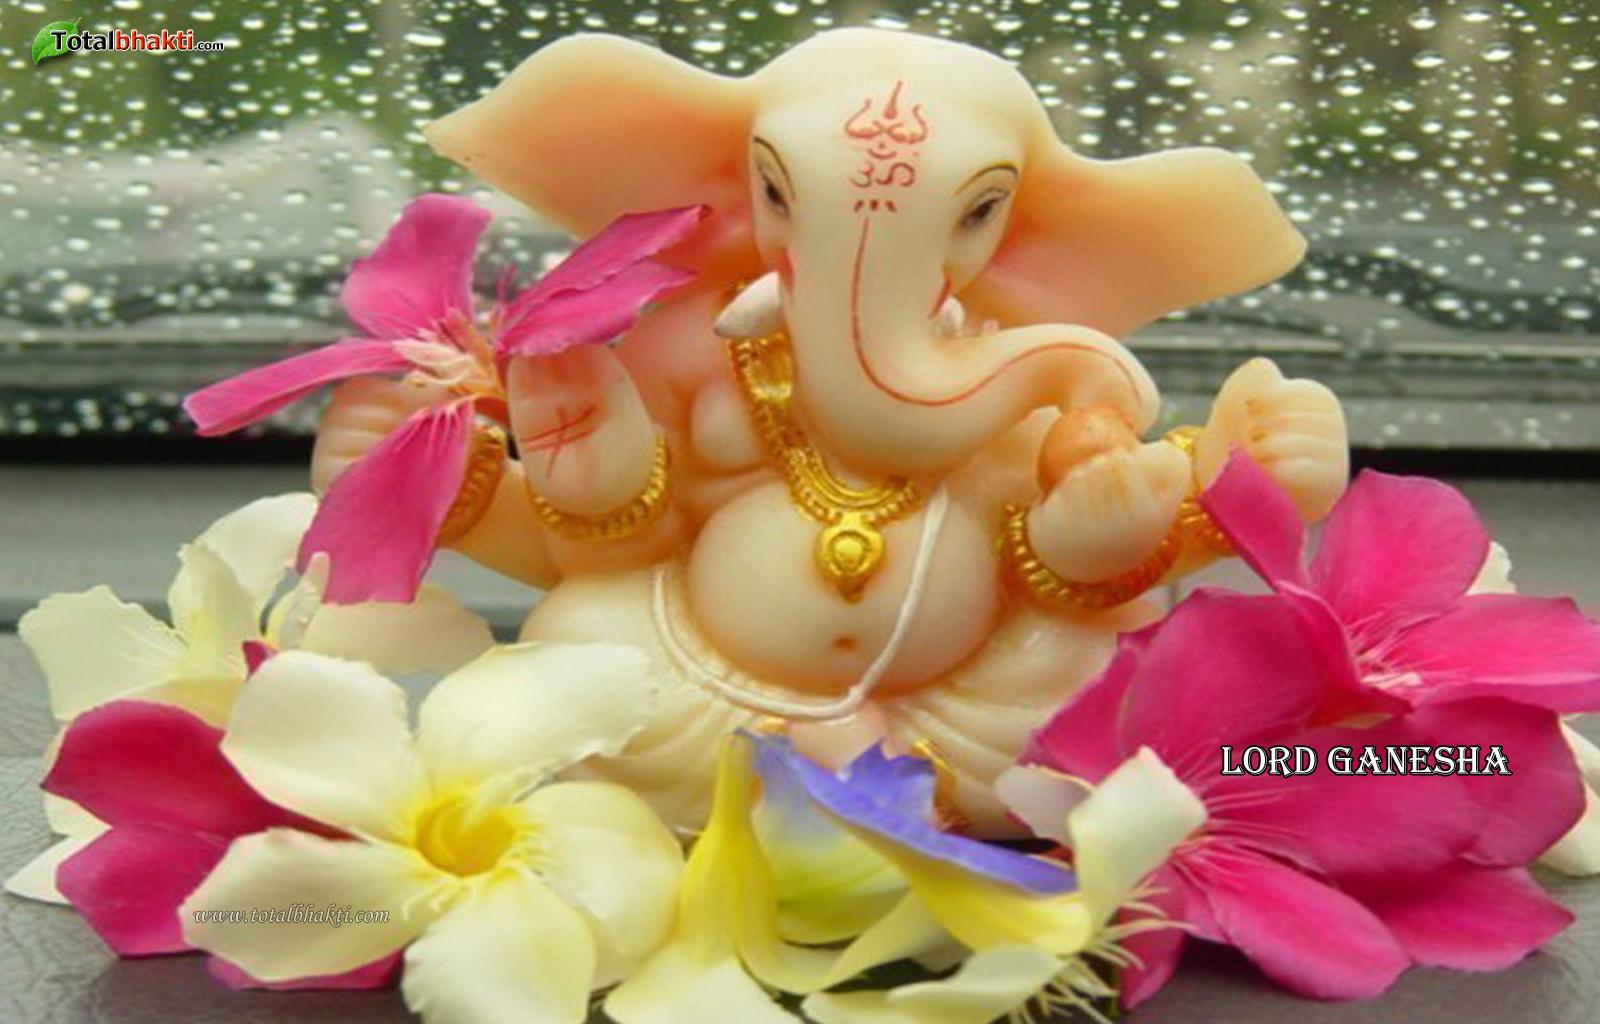 Wallpaper download ganesh - Ganesh Wallpaper Blog Beautiful Ganesh Wallpapers